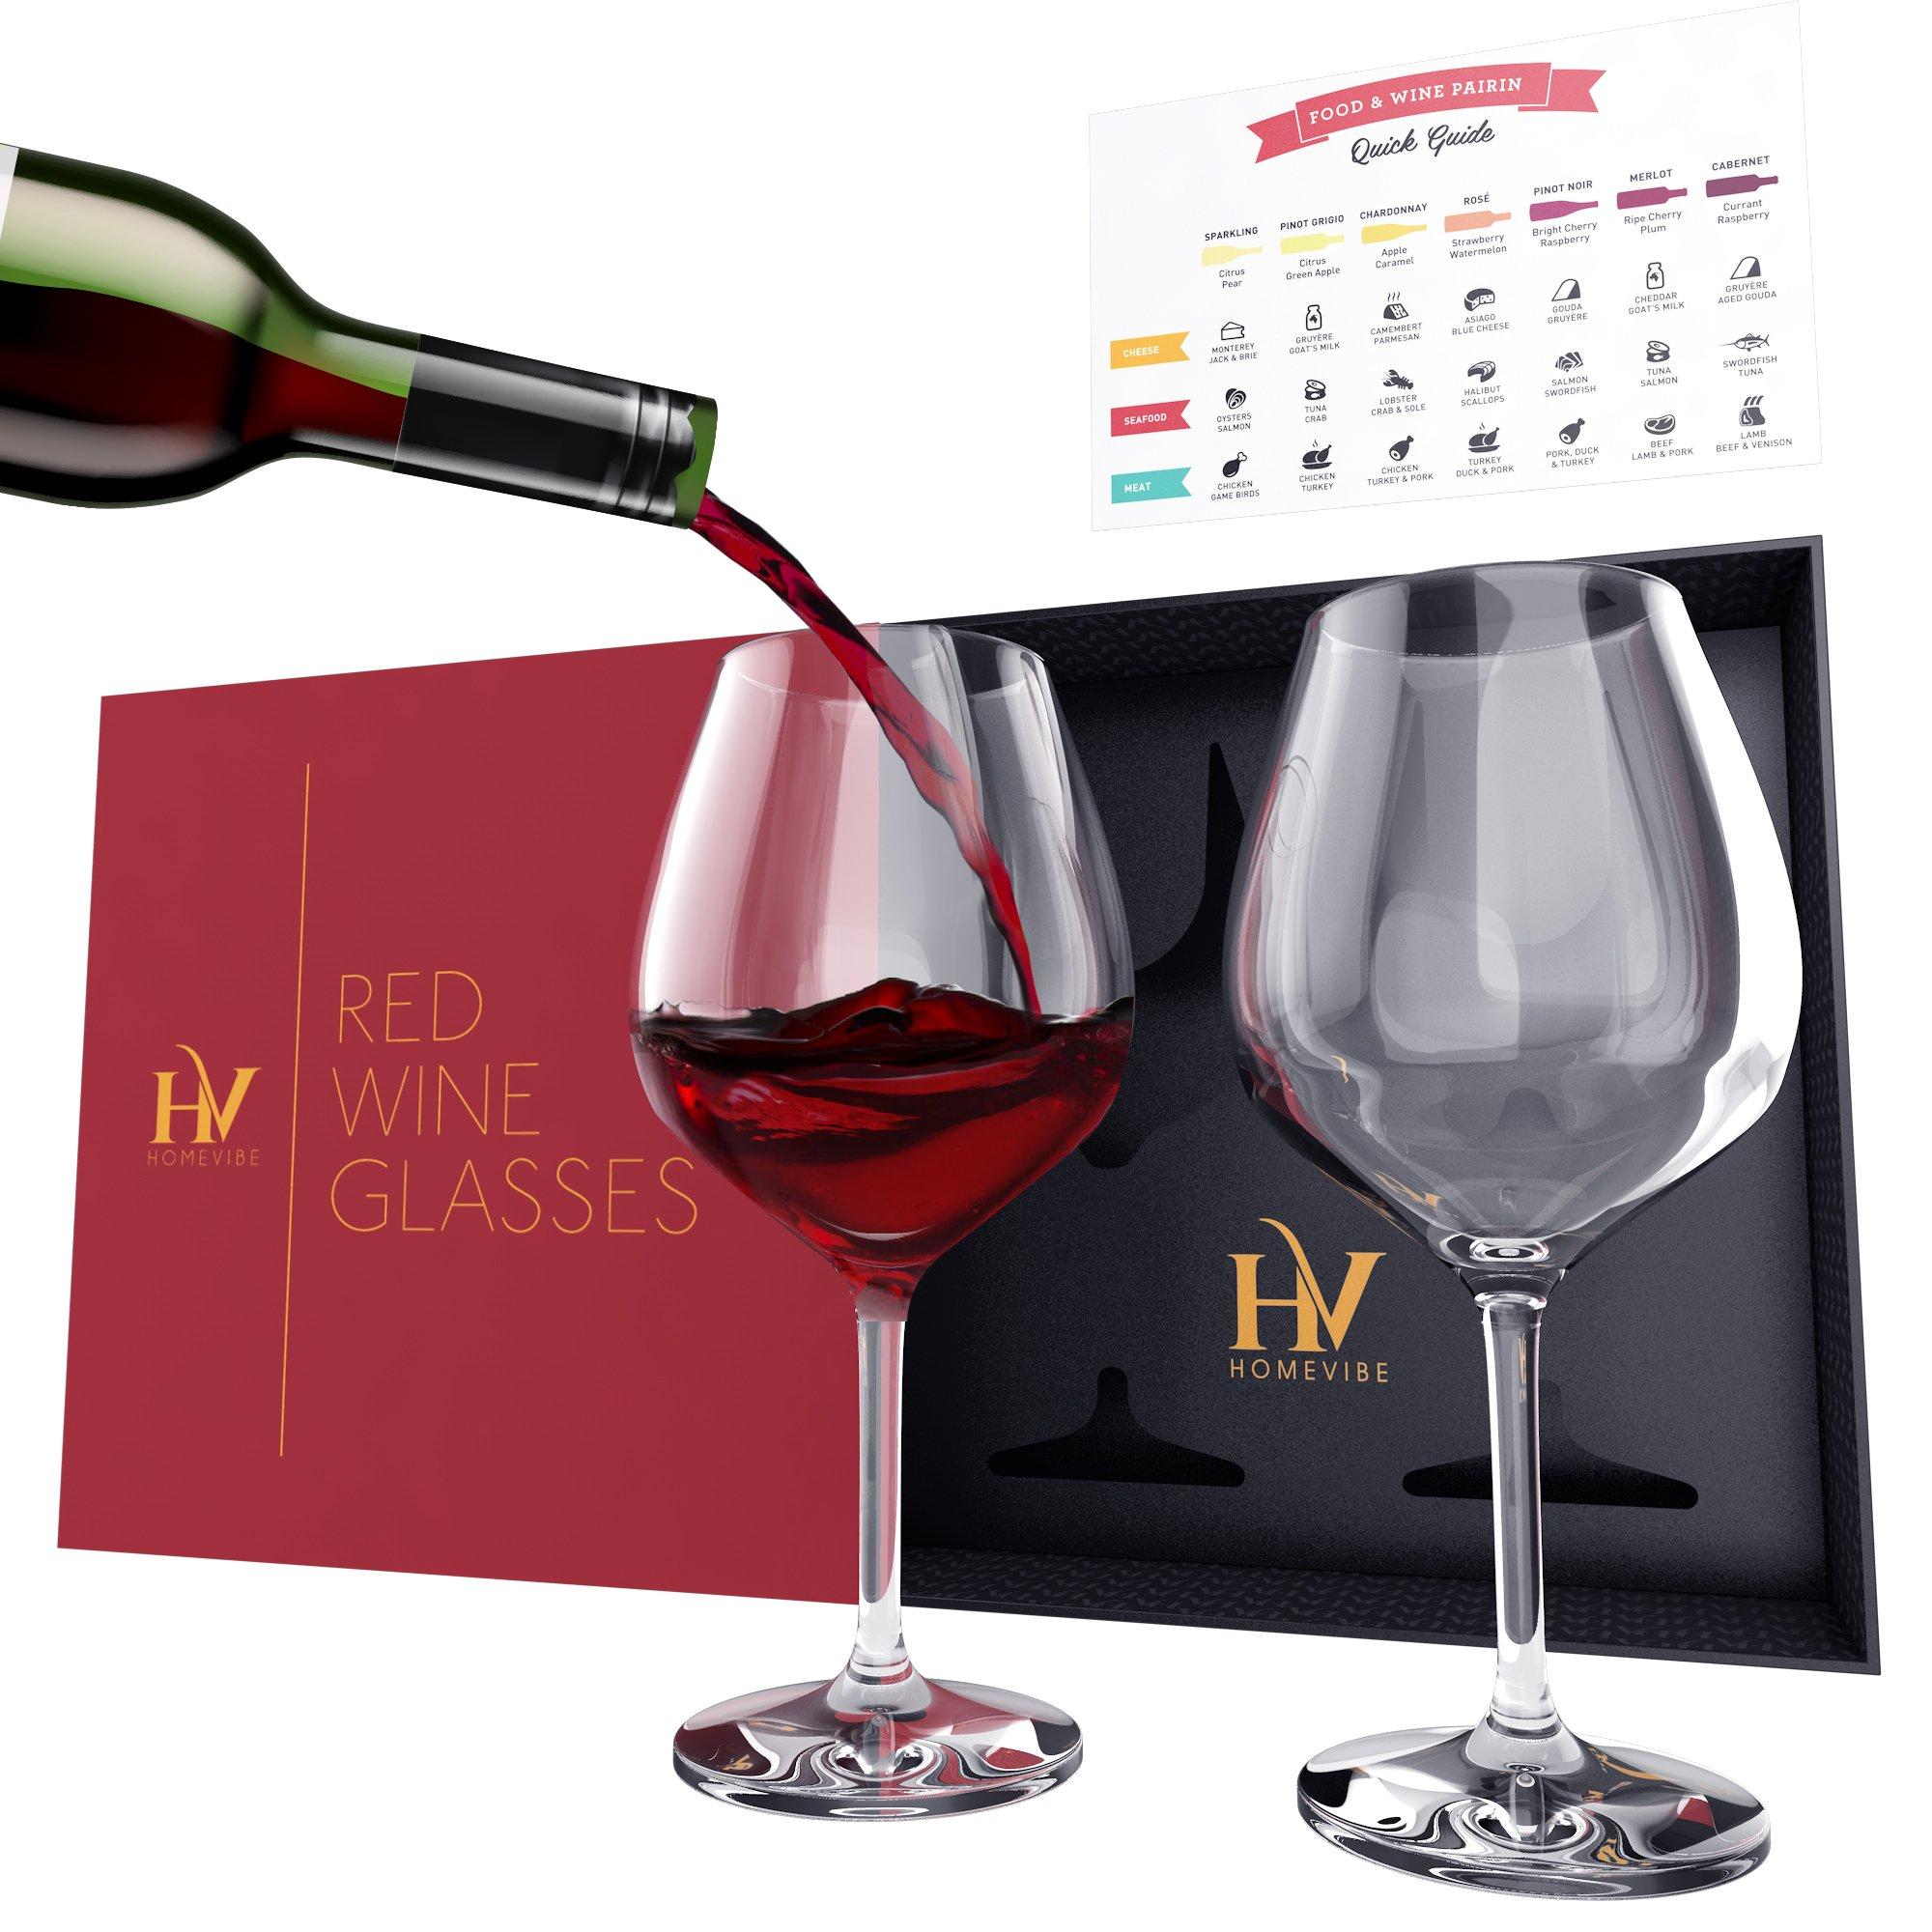 BIG Red Wine Glasses Set of 2 - 22oz Crystal Wine Glasses + Wine Cups, Long Stem Wine Glasses Set Enhances Wine Taste, Premium Crystal Glasses + Big Wine Glass Cups, Wine Tumblers & Copas de Vino